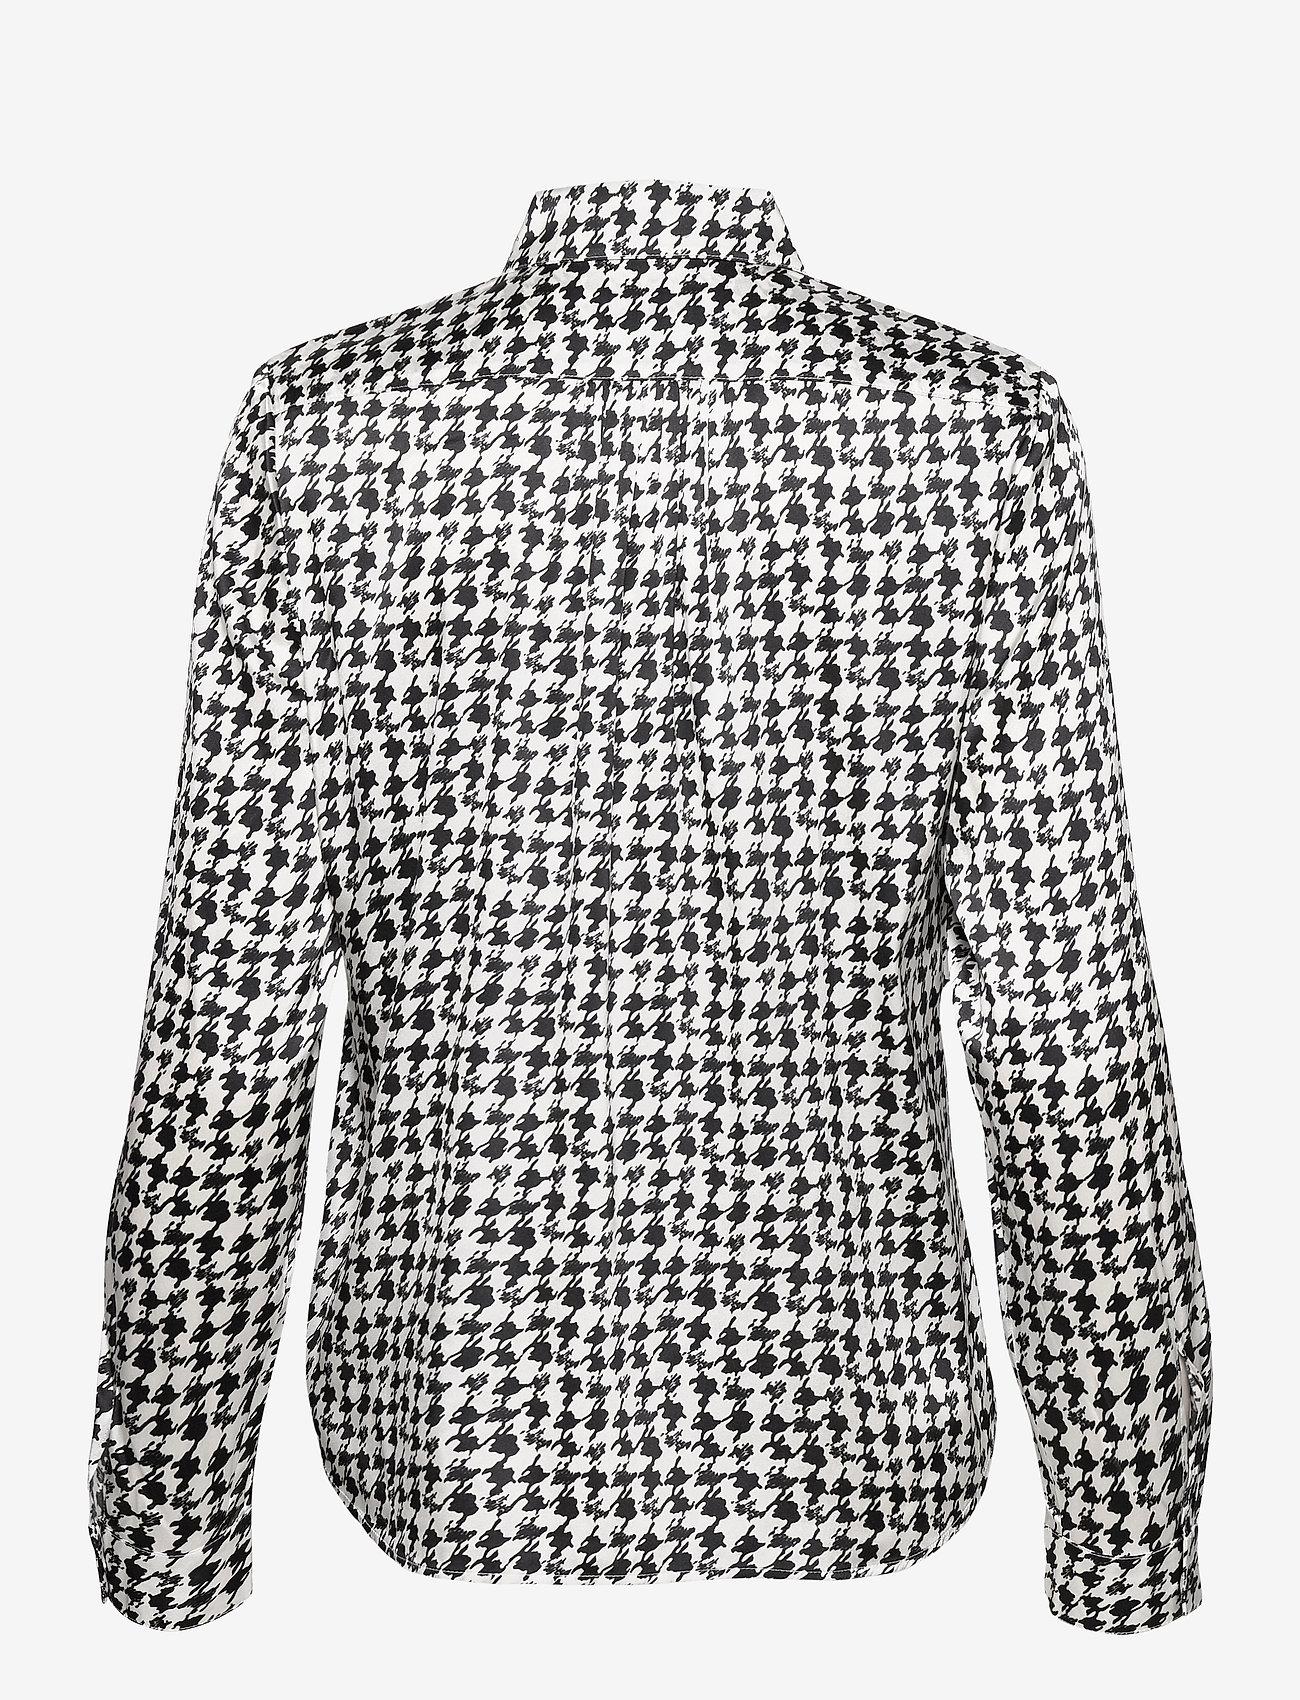 SAND - 3174 Satin - Latia - long sleeved blouses - pattern - 1